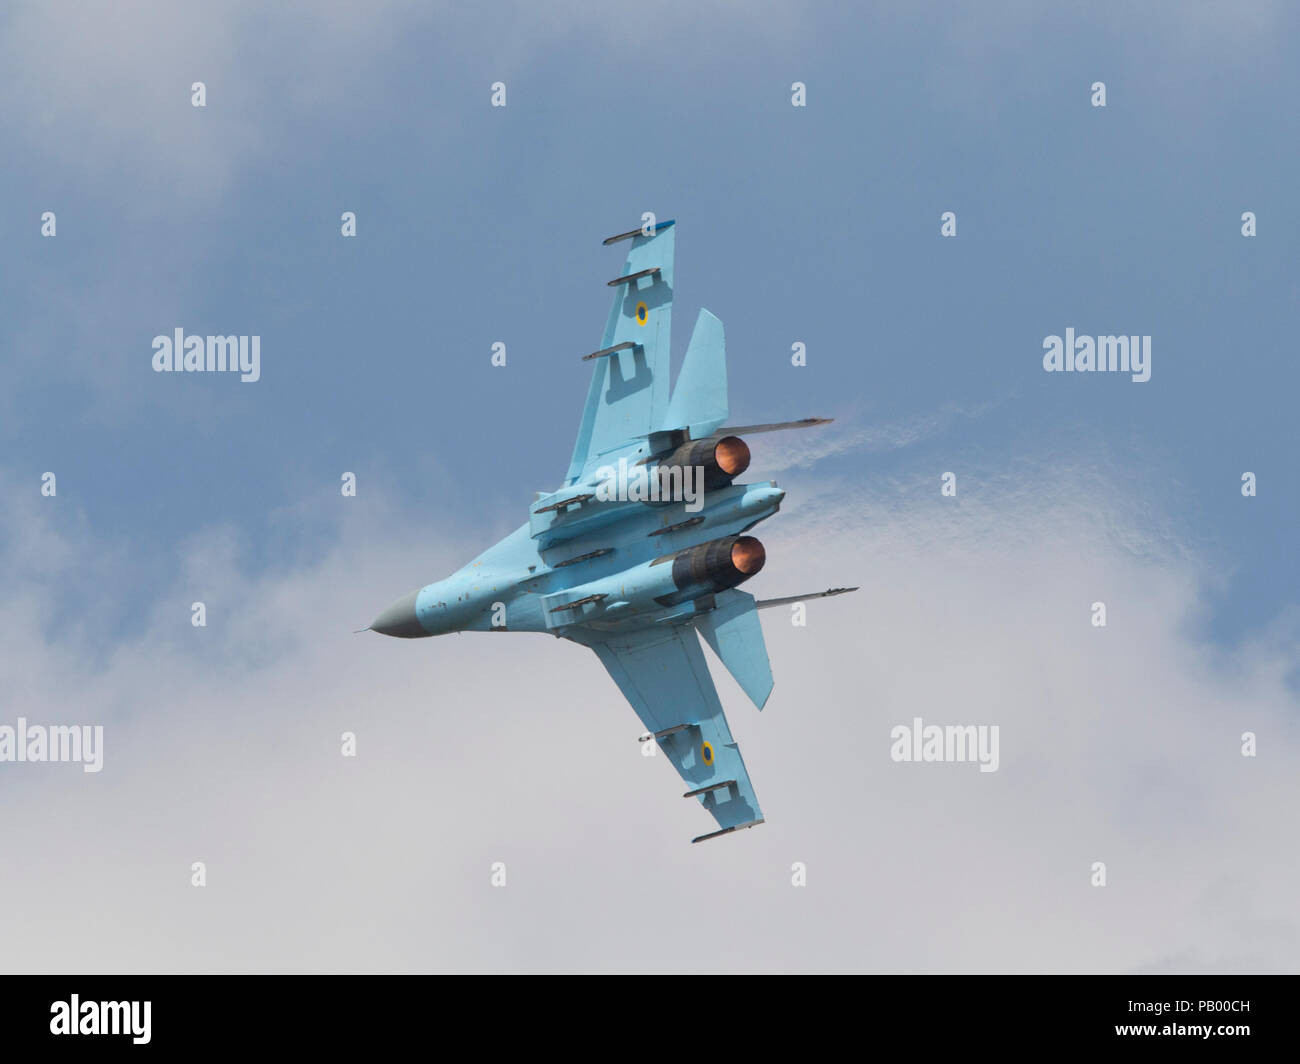 Ukrainian Sukhoi SU-27 Flanker jet fighter combat aircraft flying at the 2018 Royal International Air Tattoo - Stock Image